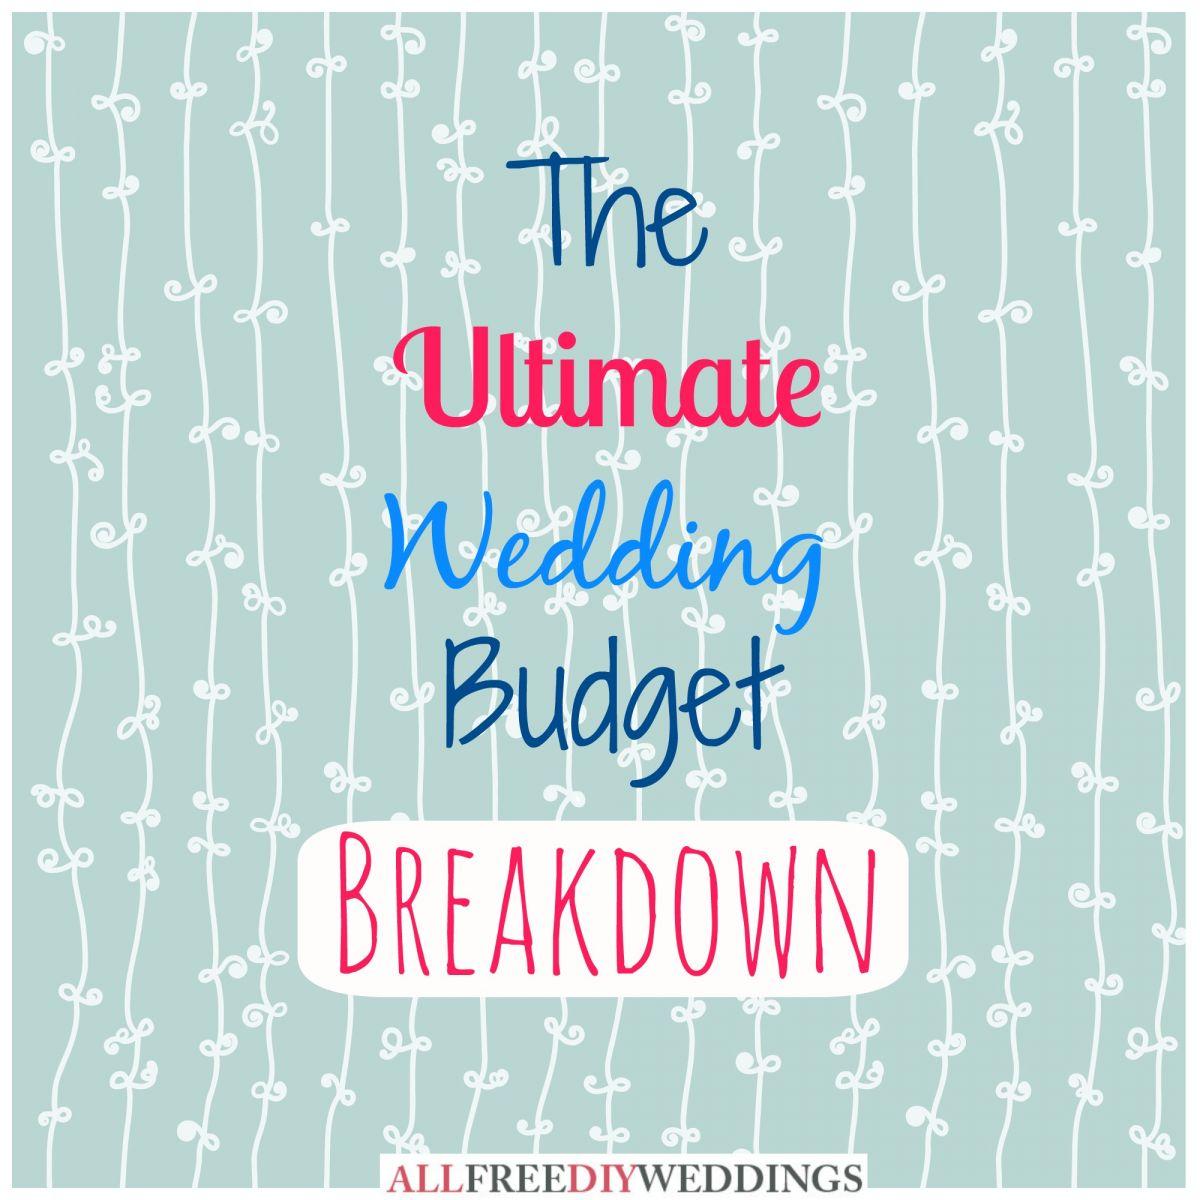 Wedding Planning Wedding Budget Breakdown